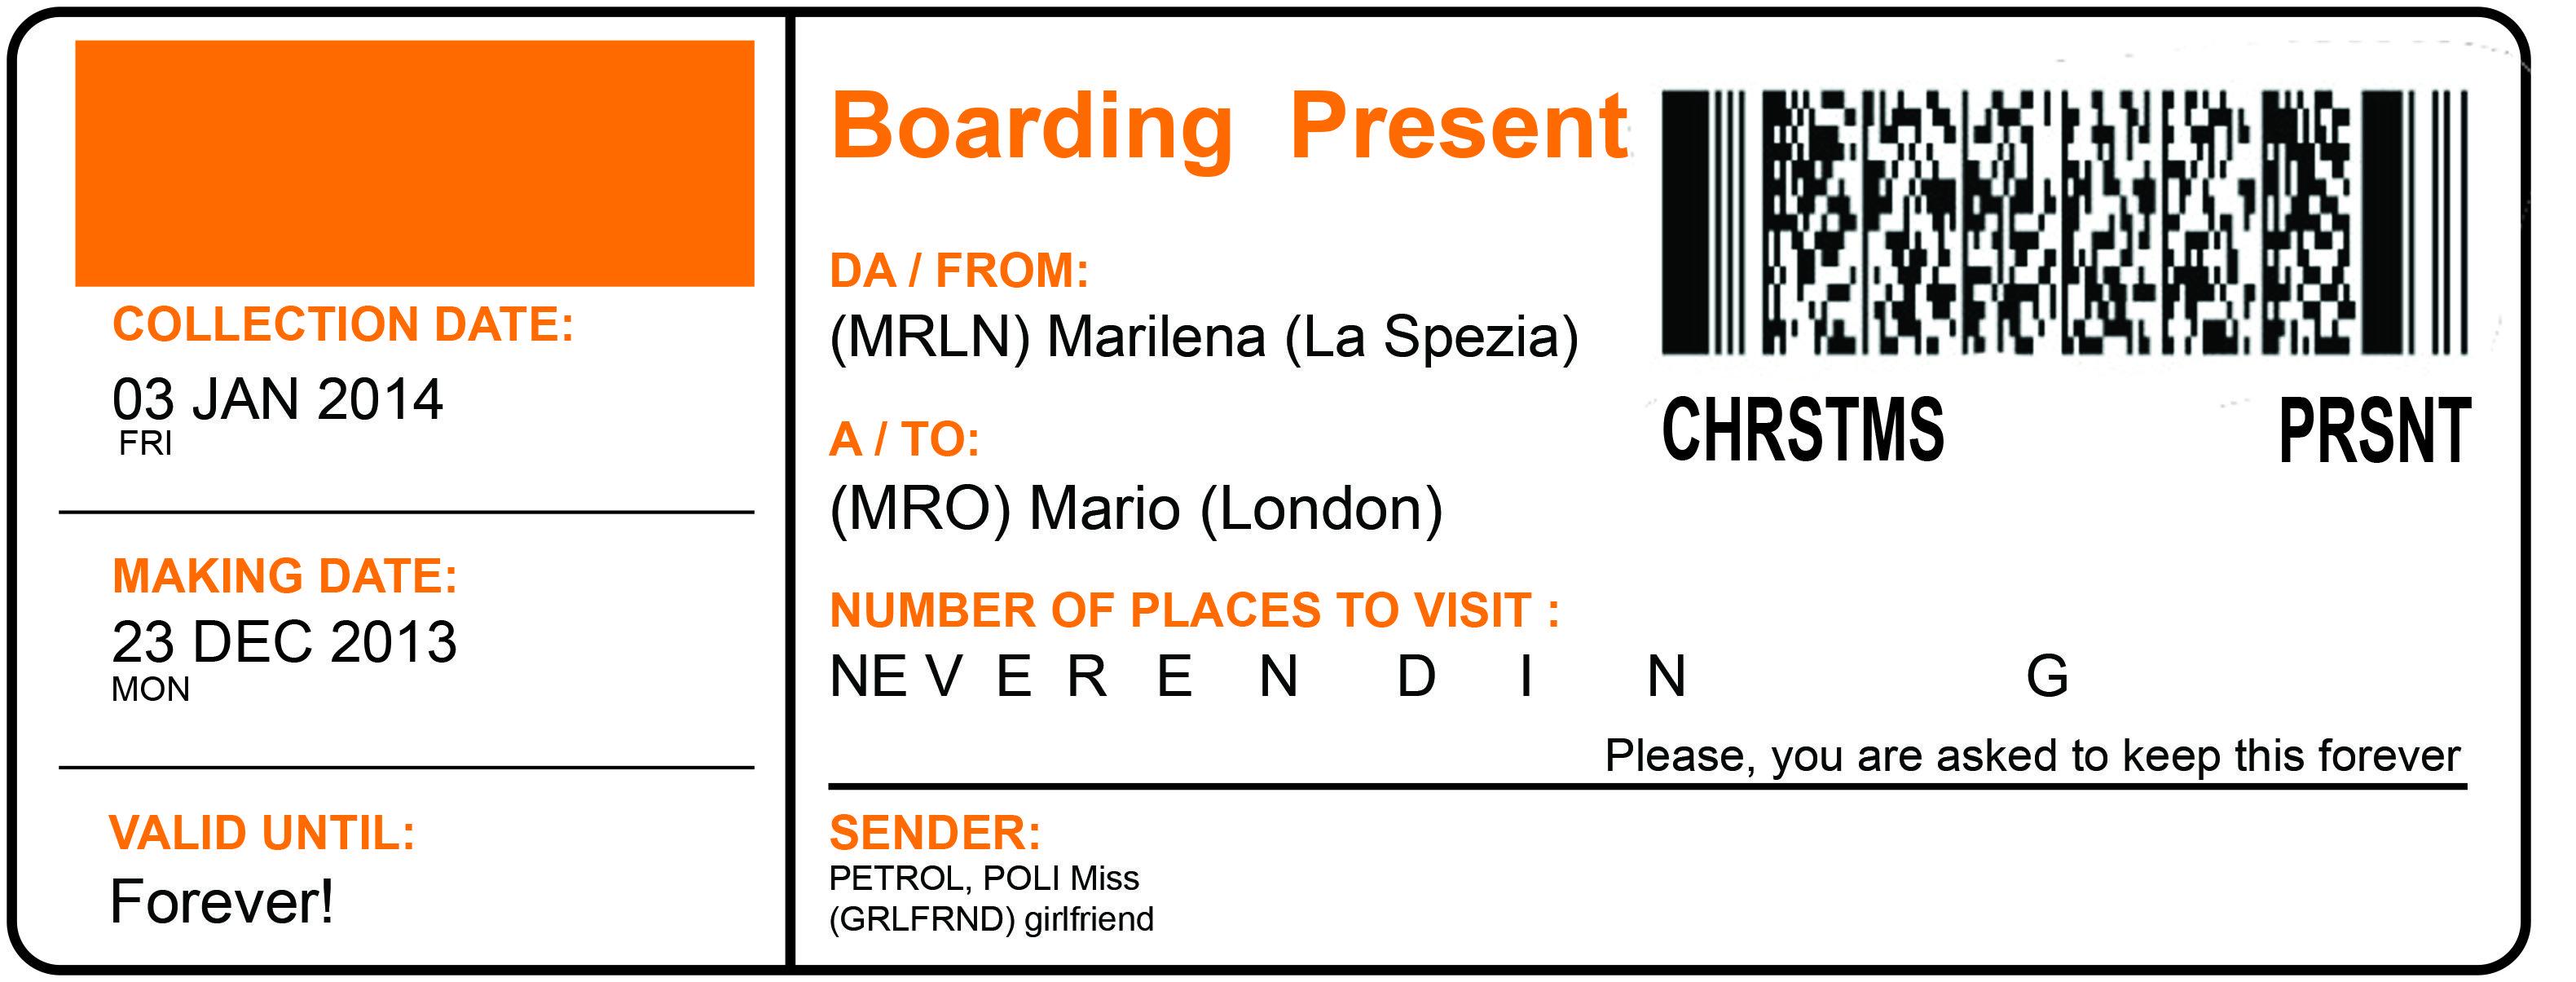 boarding present